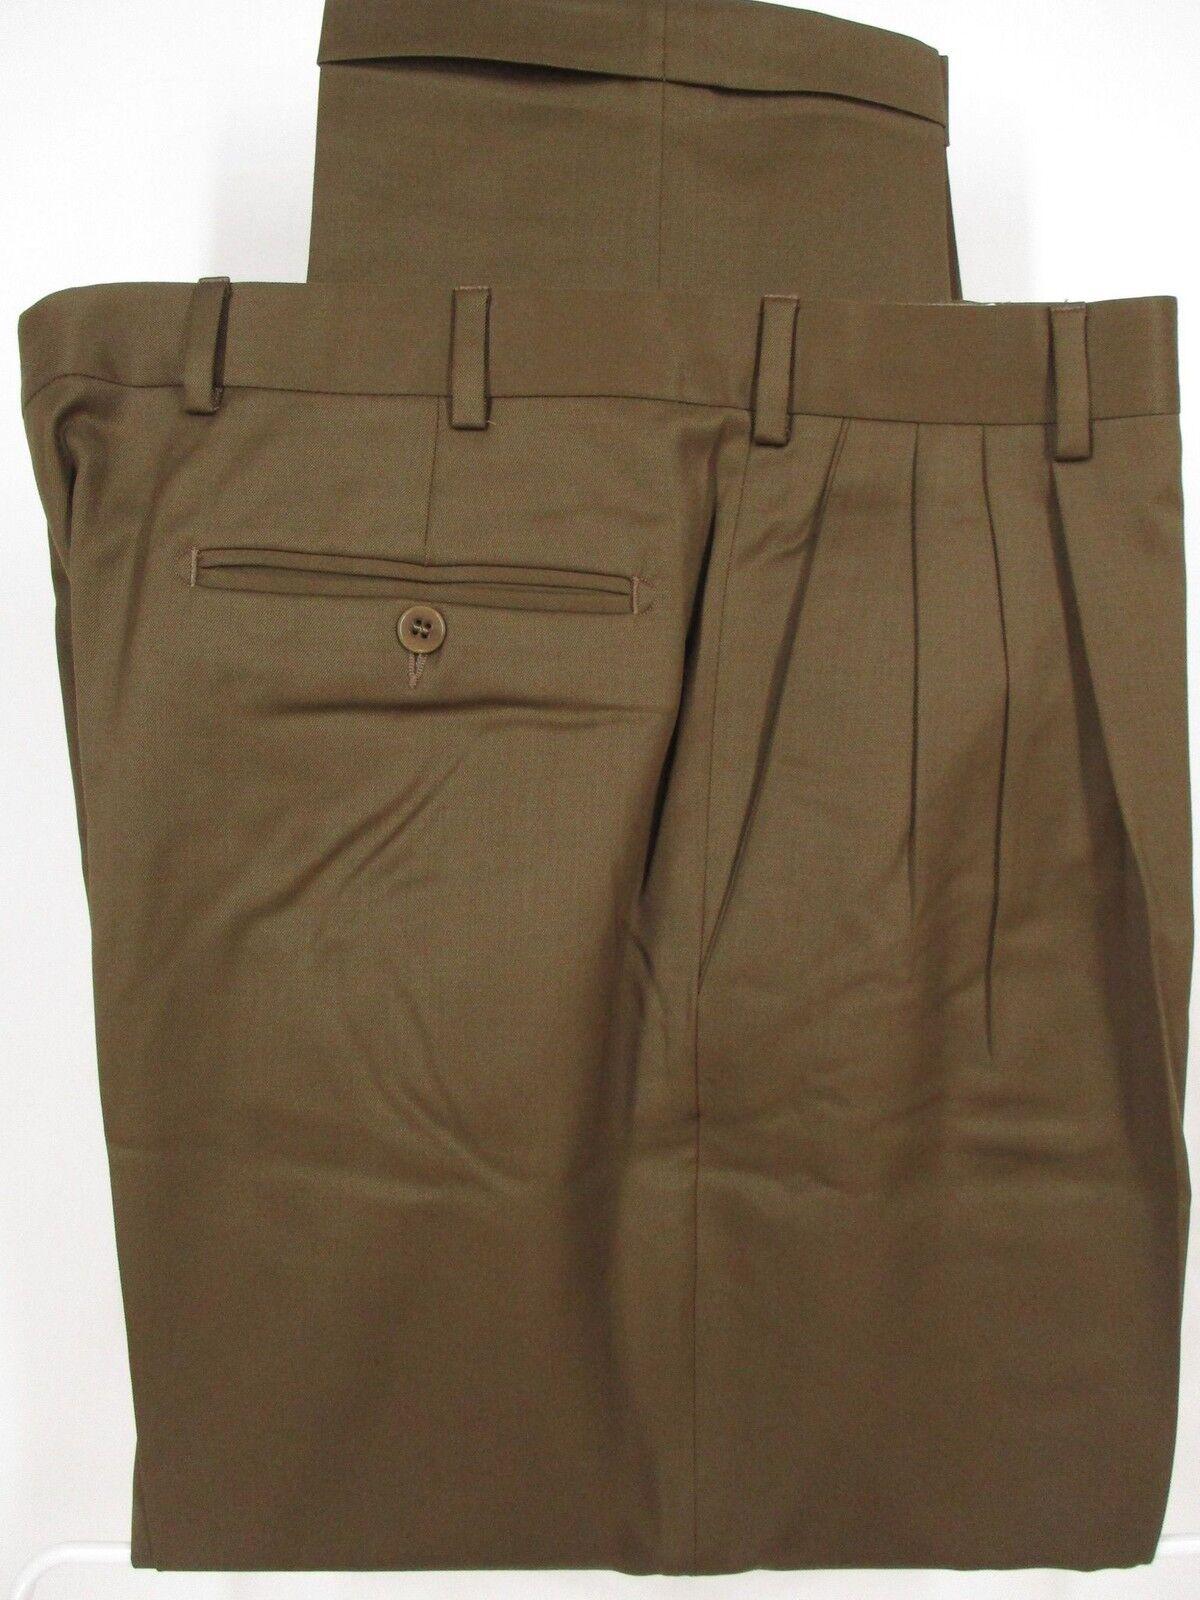 Zanella Alter Mens Brown Pleated Wool Dress Pants size 34 35x27